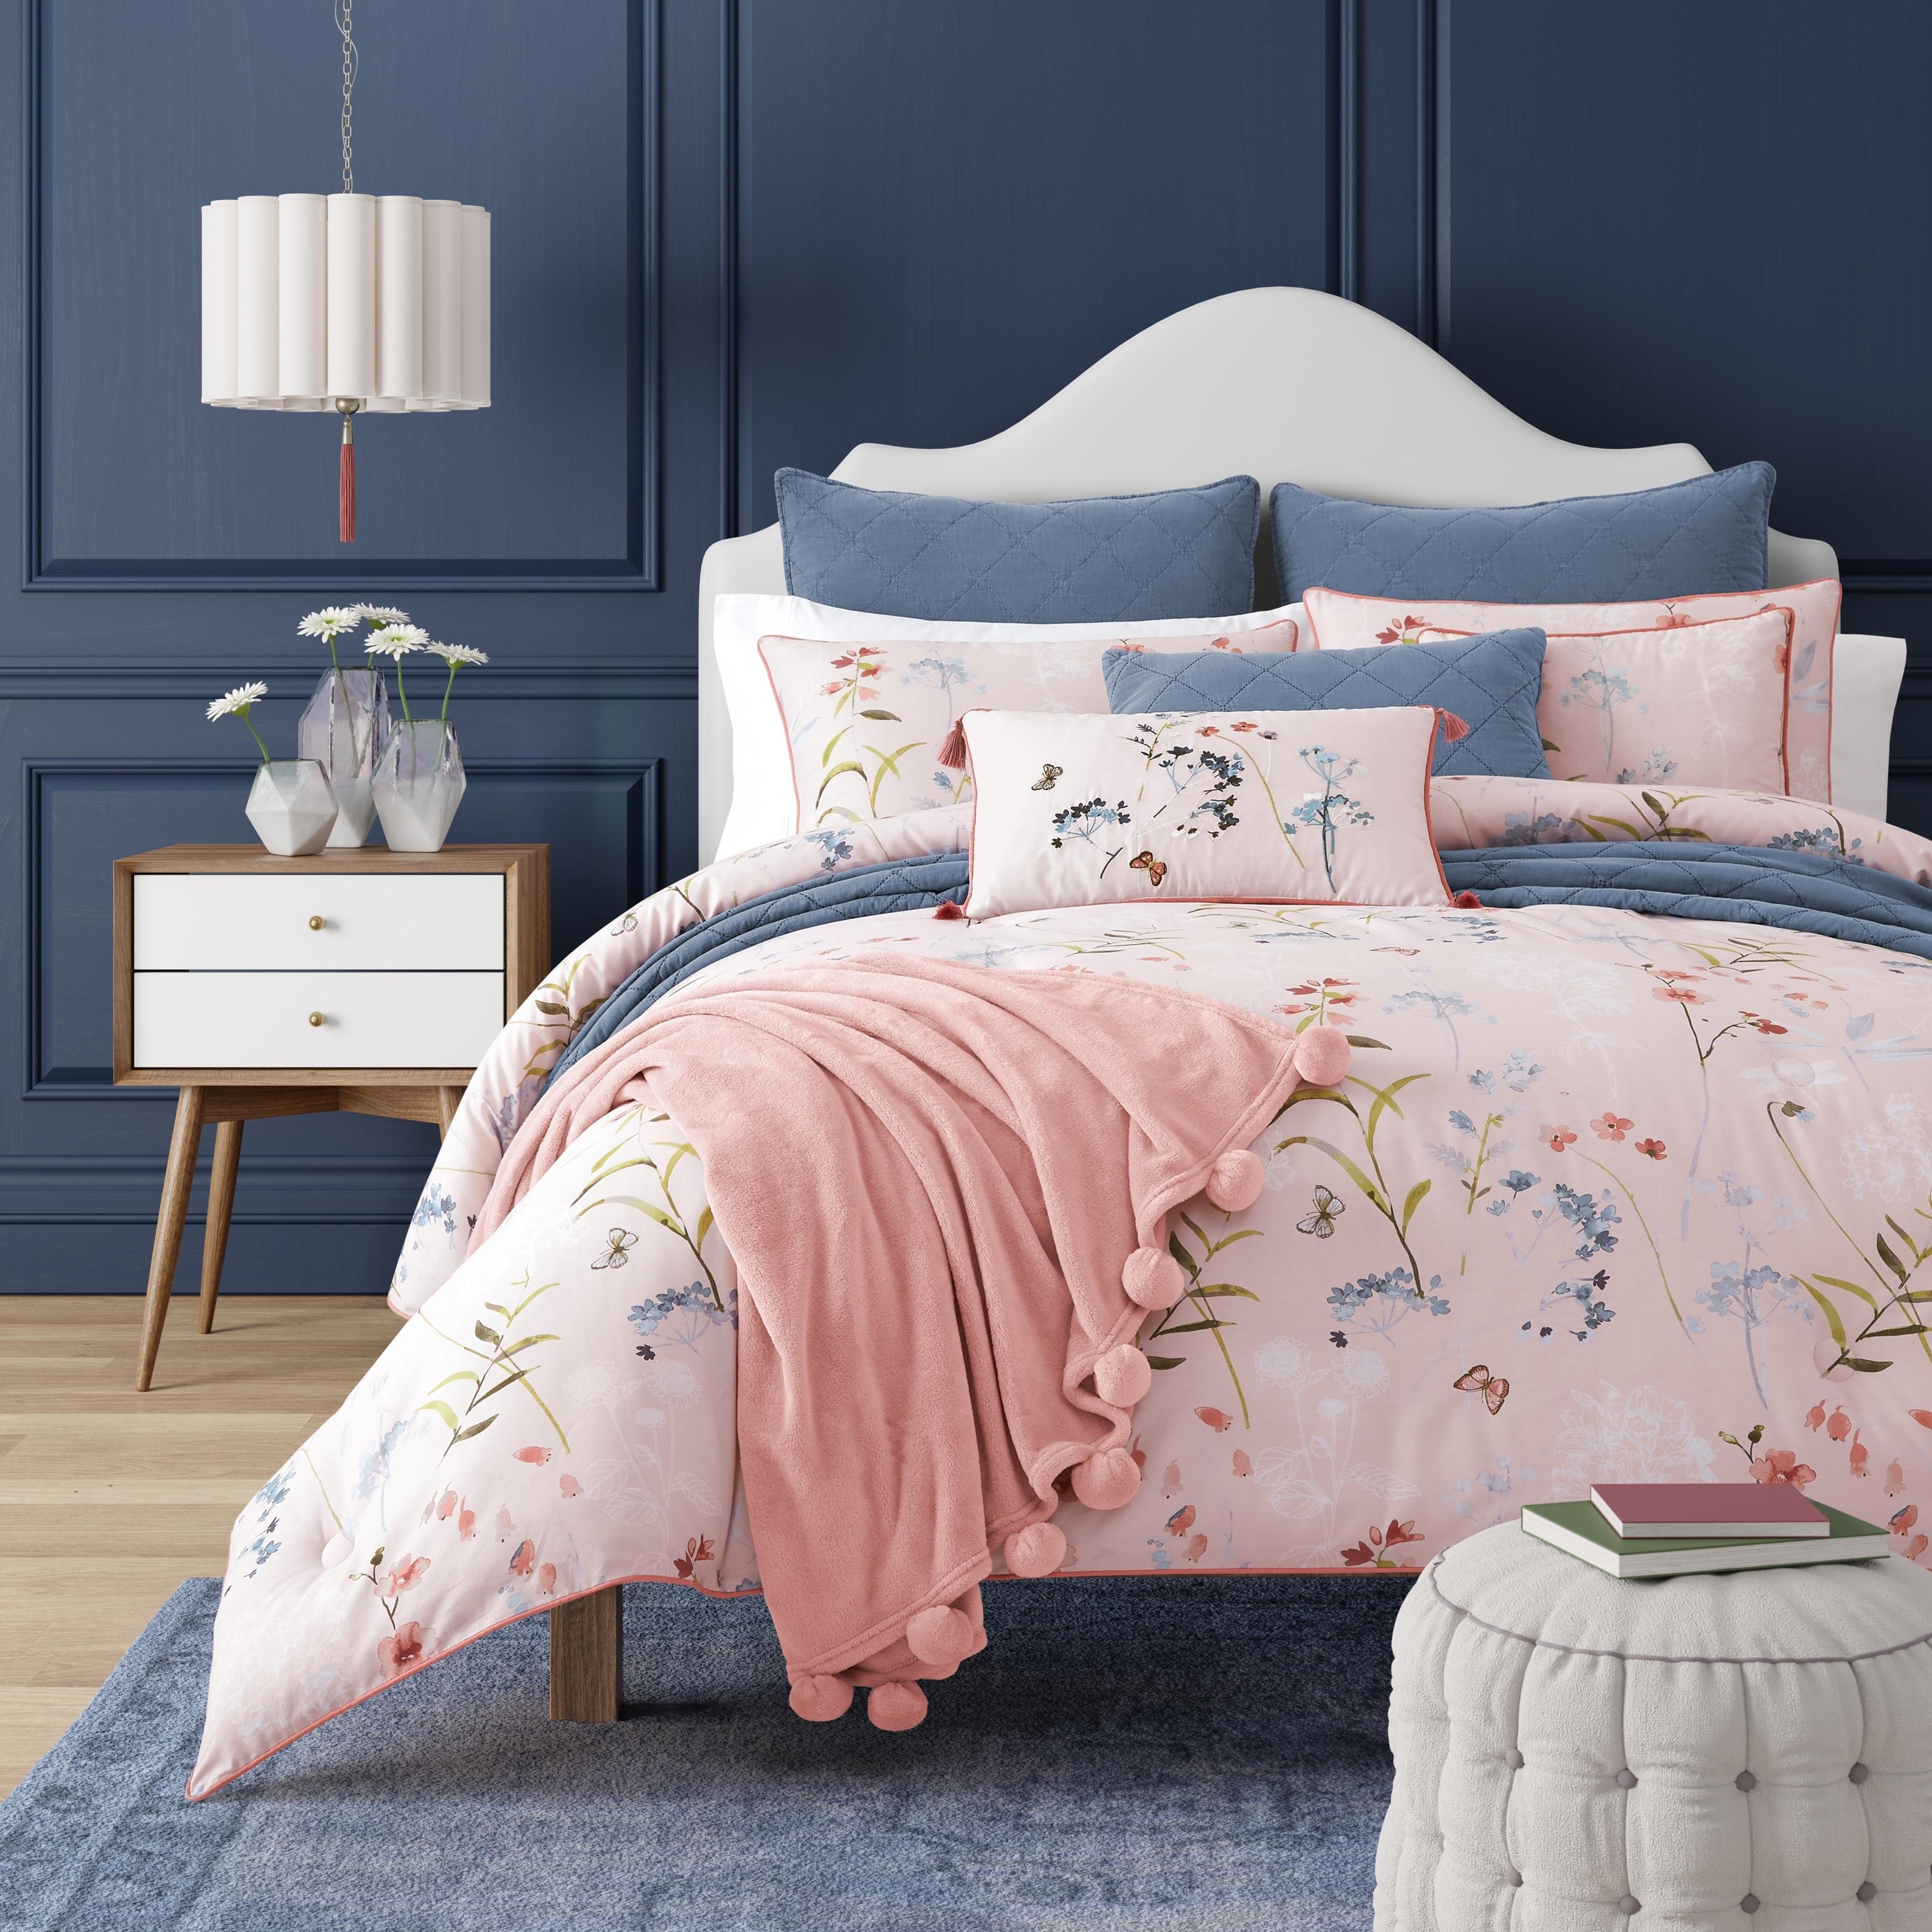 Floral Five Queens Court Comforter Sets Find Great Bedding Deals